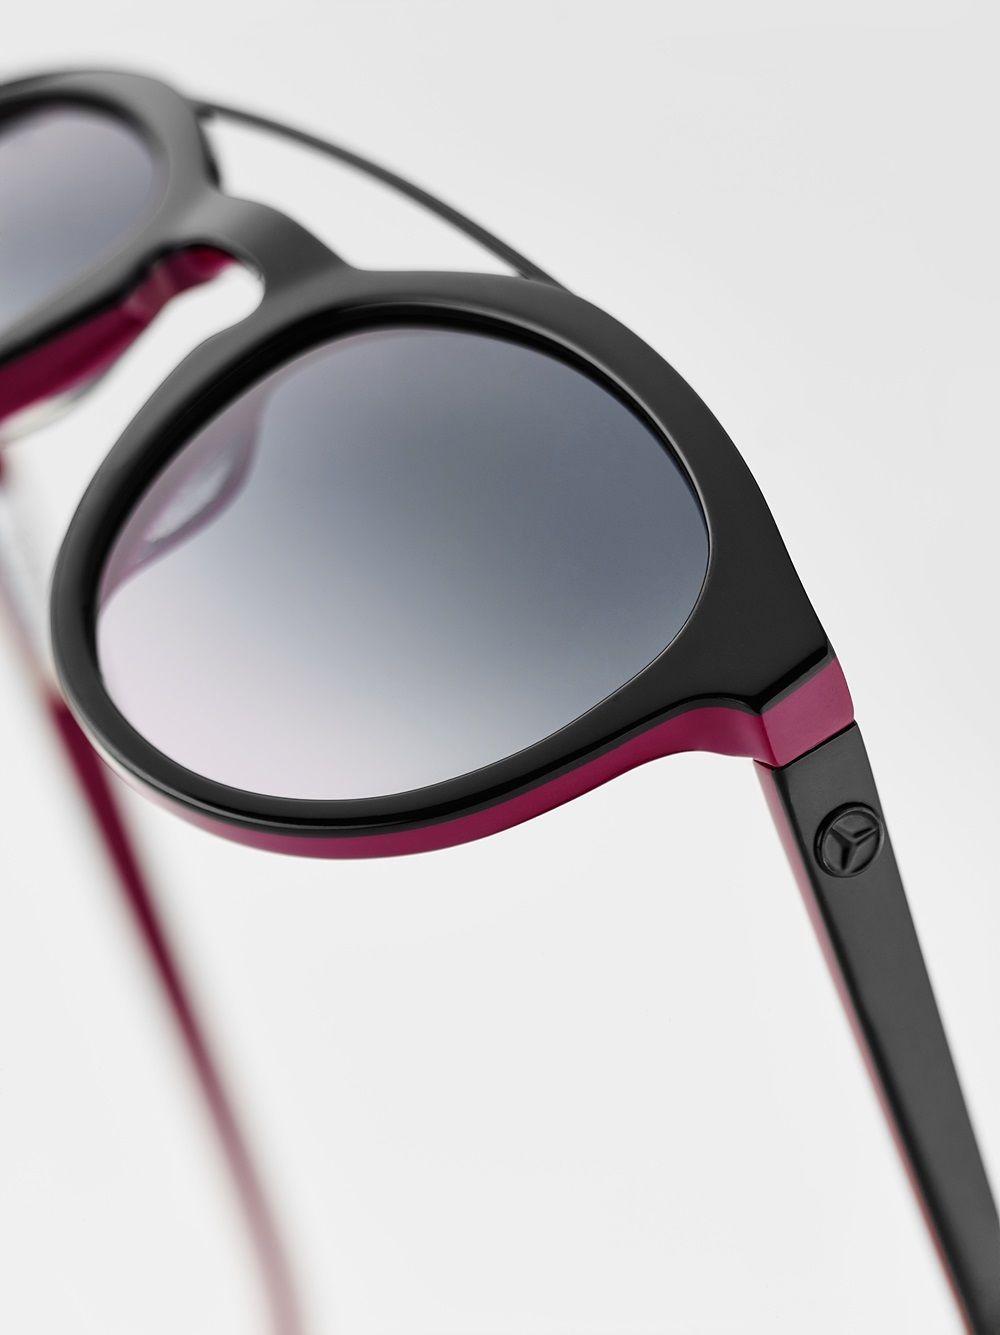 Mercedes benz sunglasses women carl zeiss and 50 similar items for Mercedes benz sunglasses